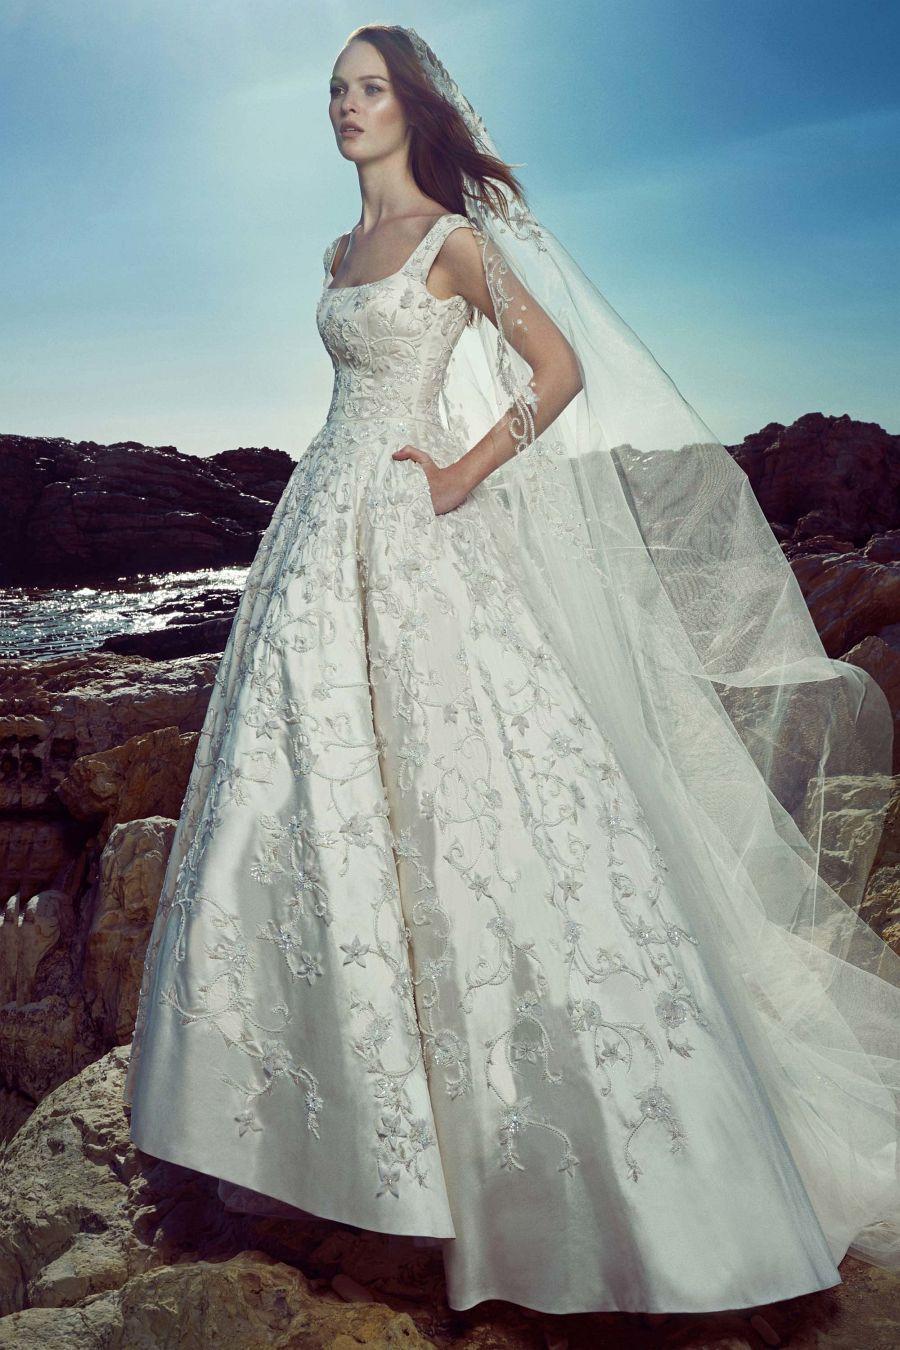 26 The Most Beautiful Wedding Dresses of 2017 | Pinterest | Wedding ...